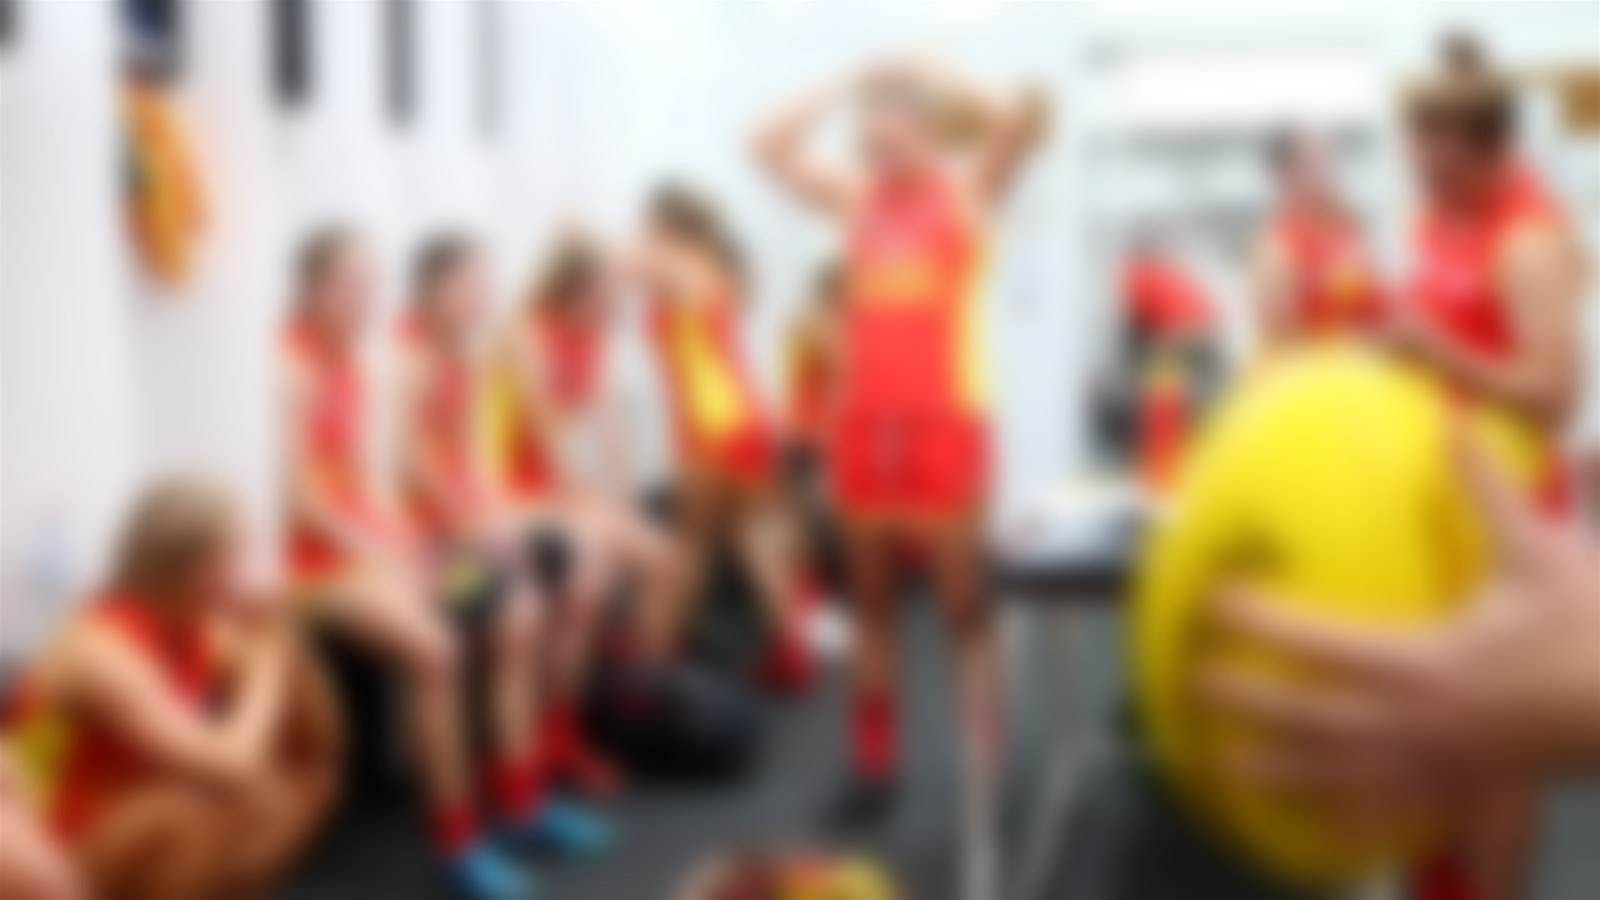 AFLW unveils new gender diversity policy